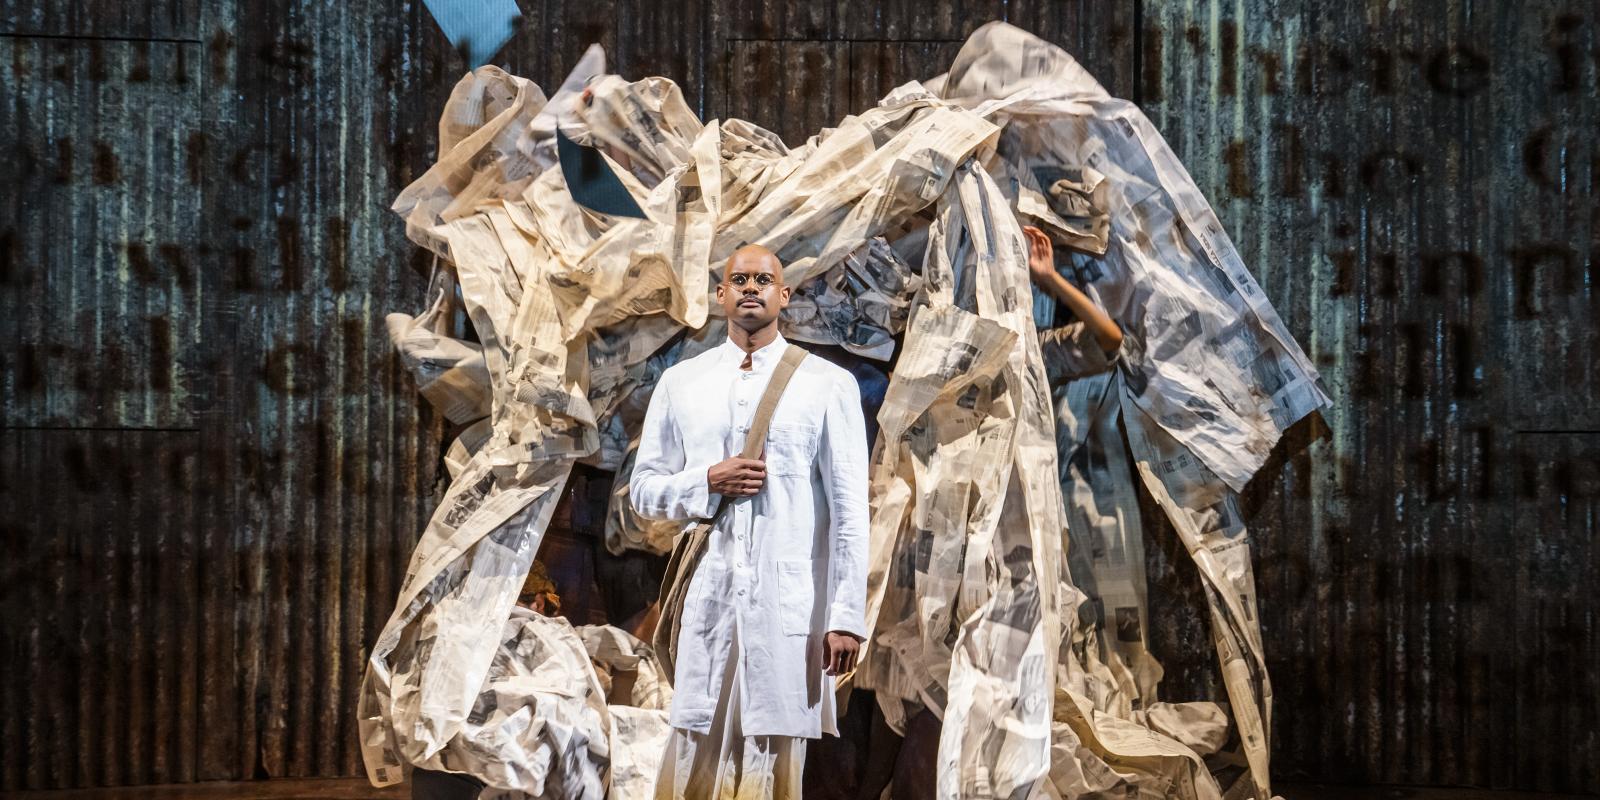 ENO2122 Satyagraha: Sean Panikkar as Gandhi © Tristram Kenton